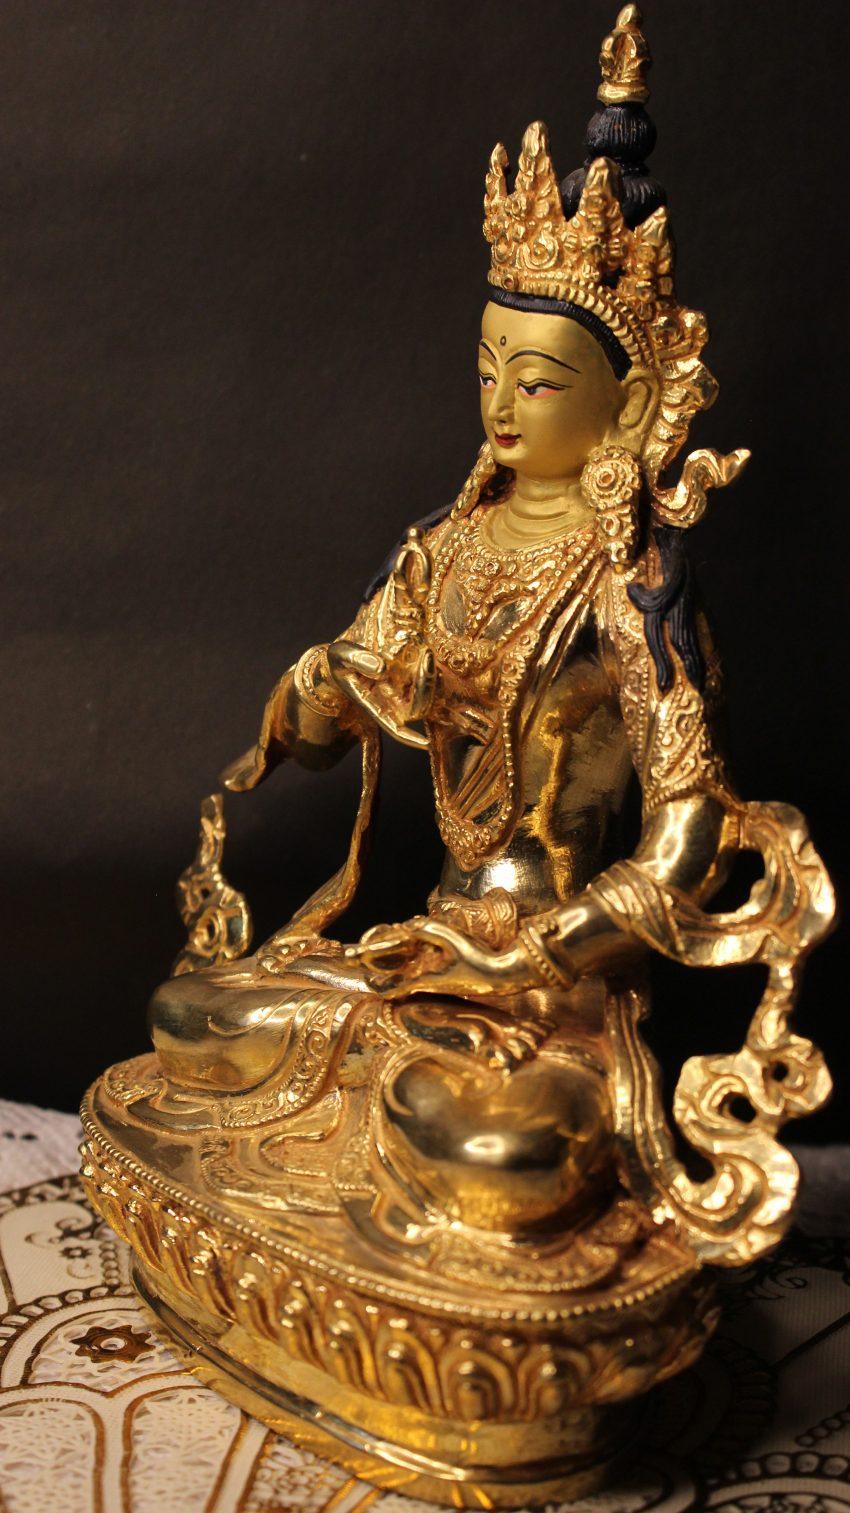 Golden Vajrasattva buddha Statue